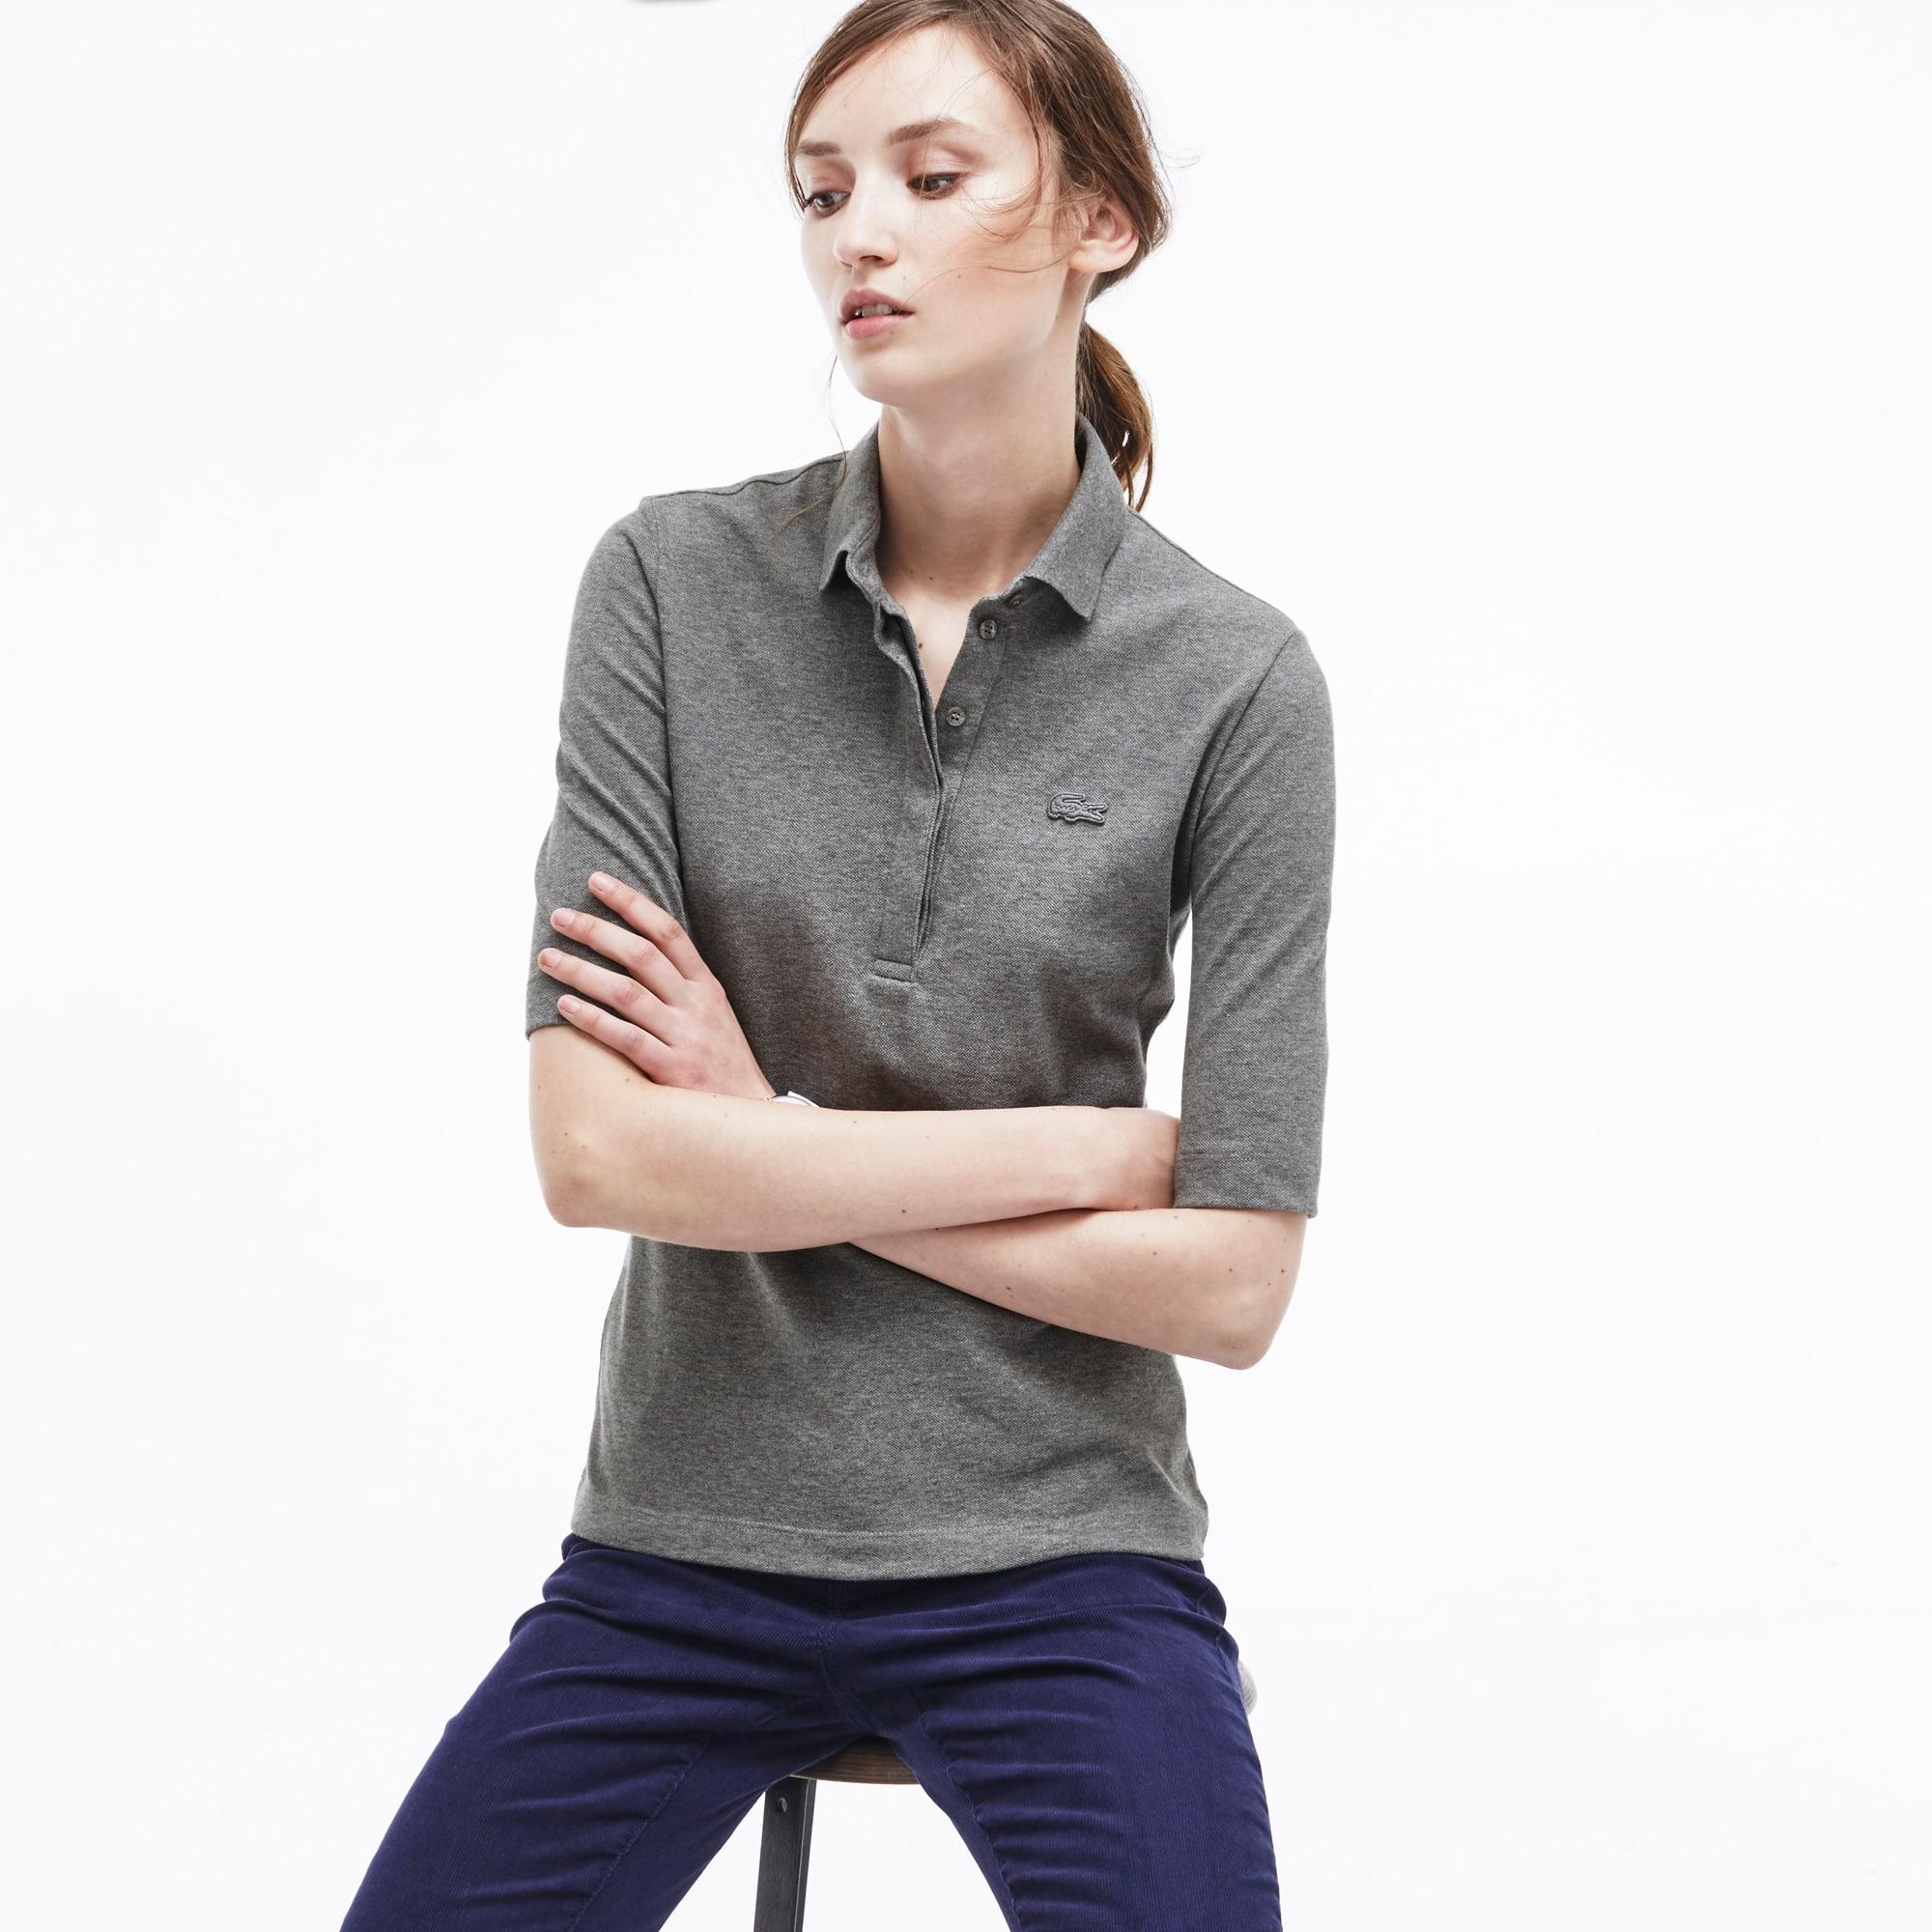 Women's Slim Fit Half Sleeve Stretch Piqué Polo Shirt